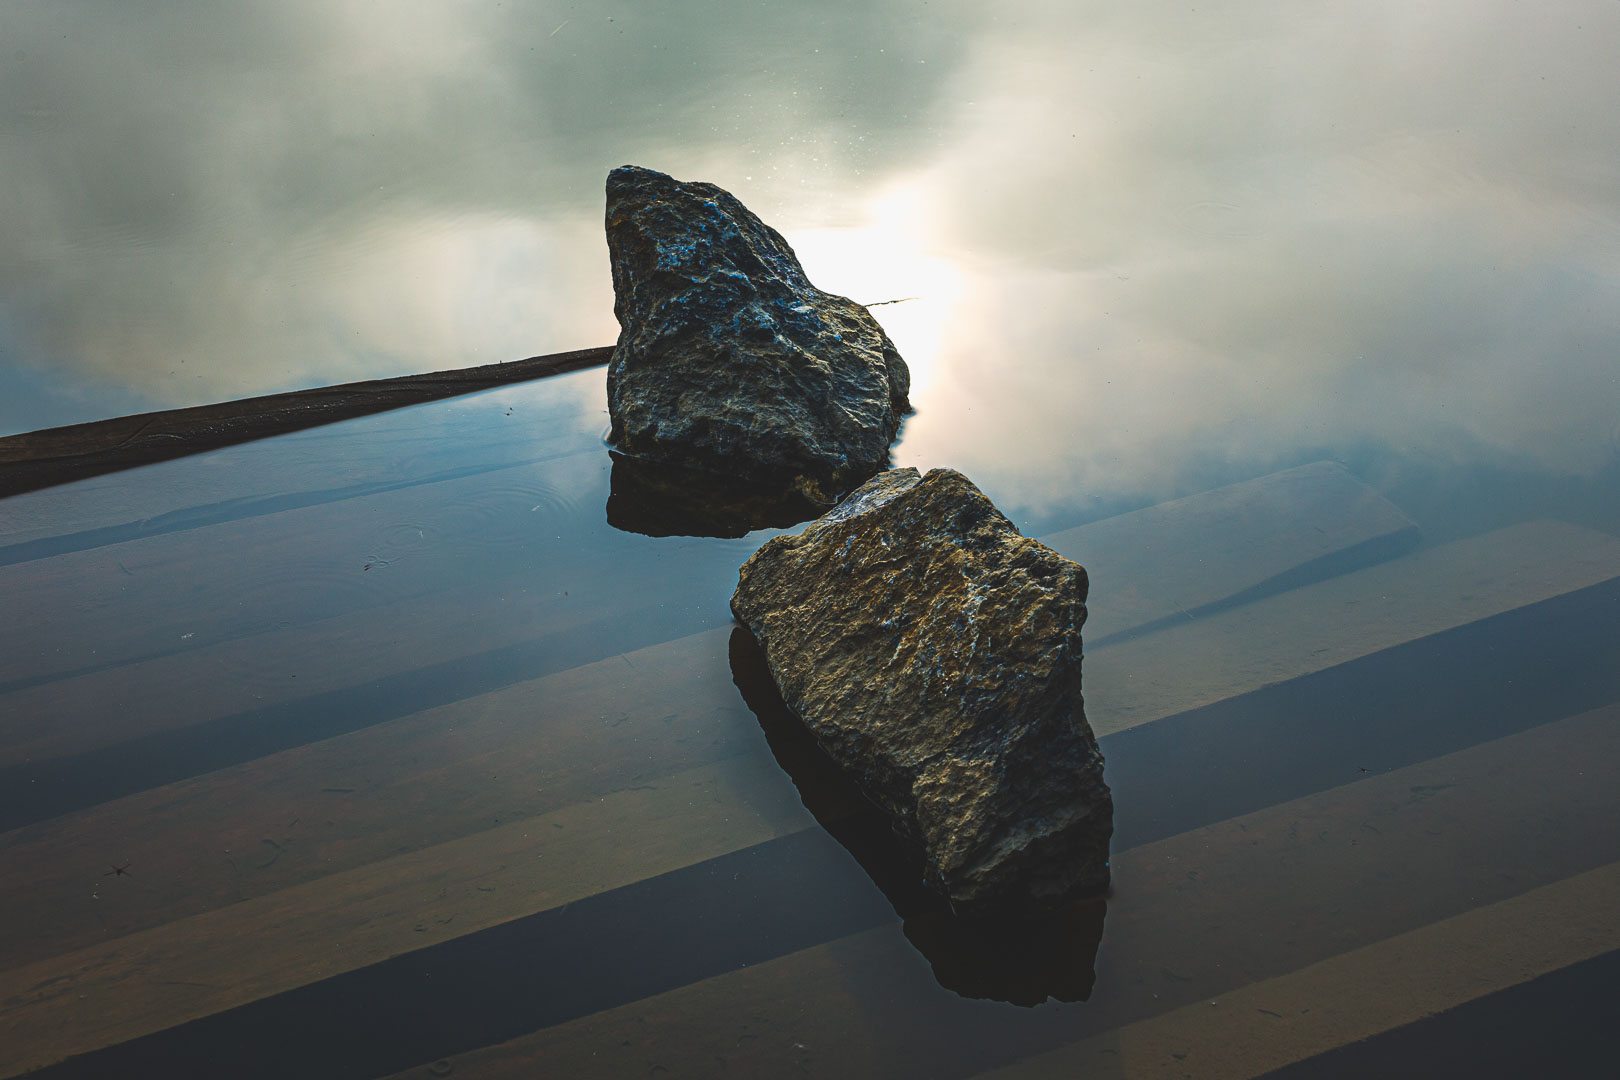 rochas na água com reflexo